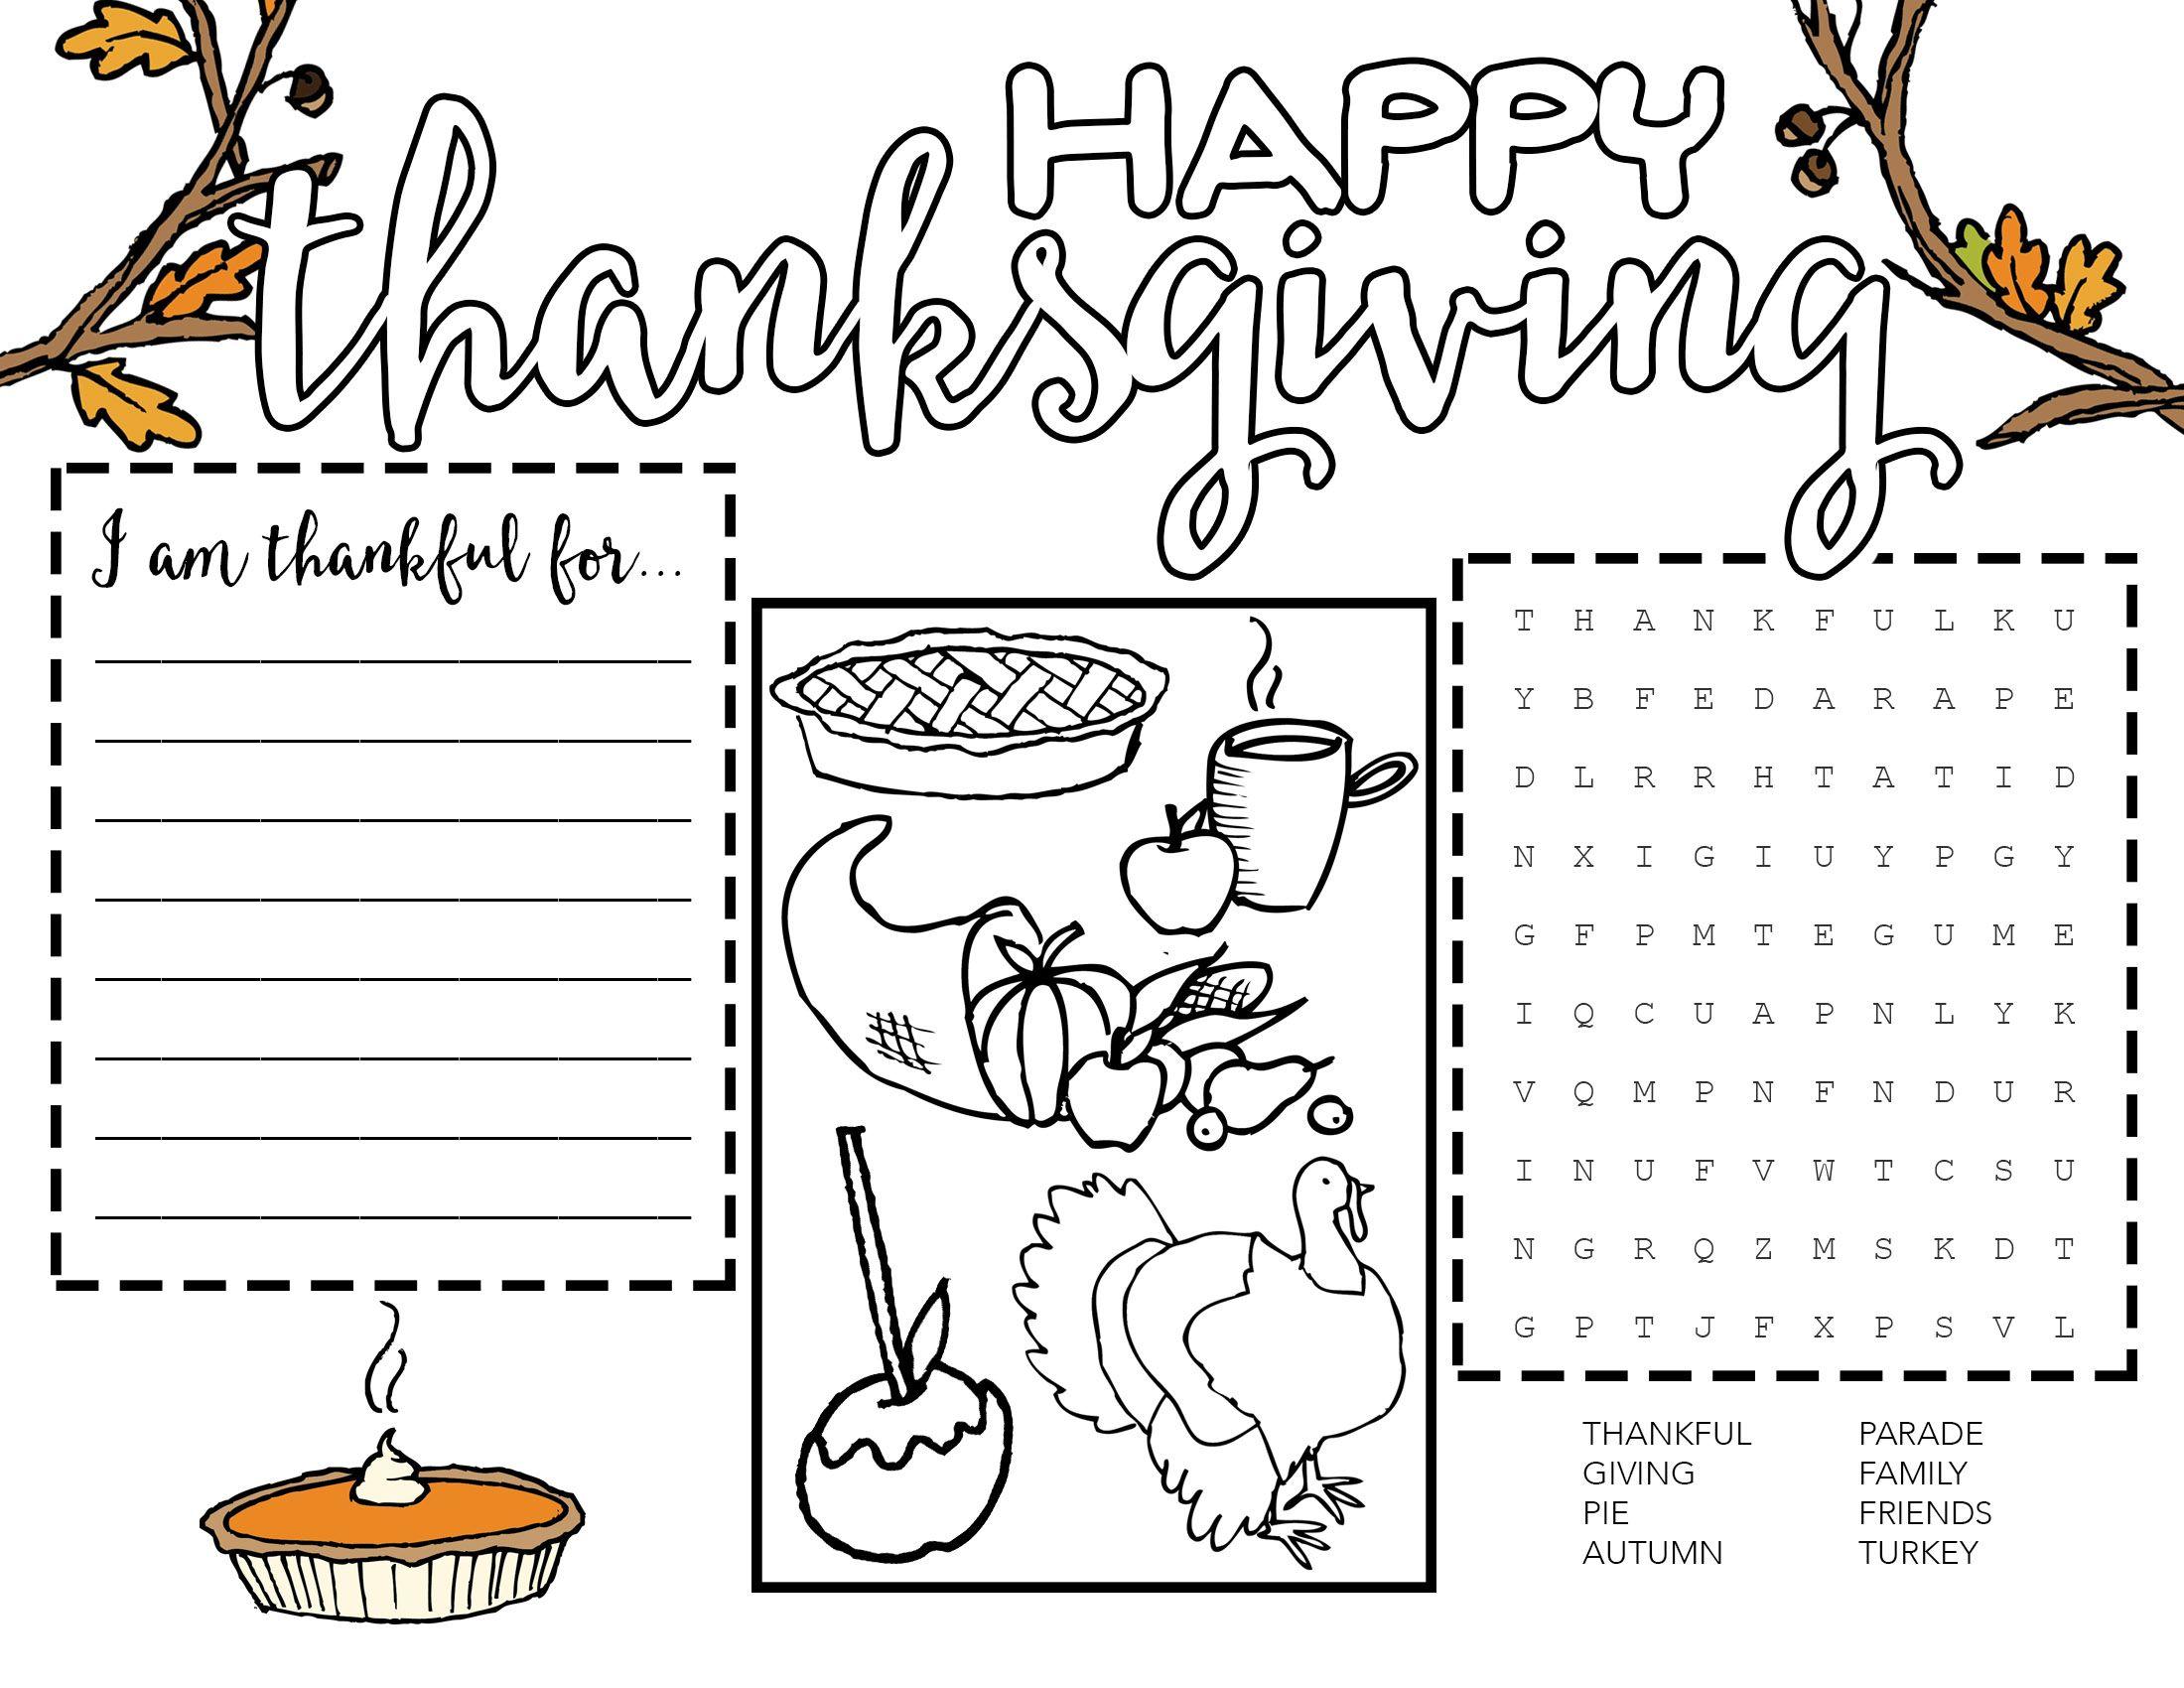 Free Printable Thanksgiving Placemat Wit Wander 2 200